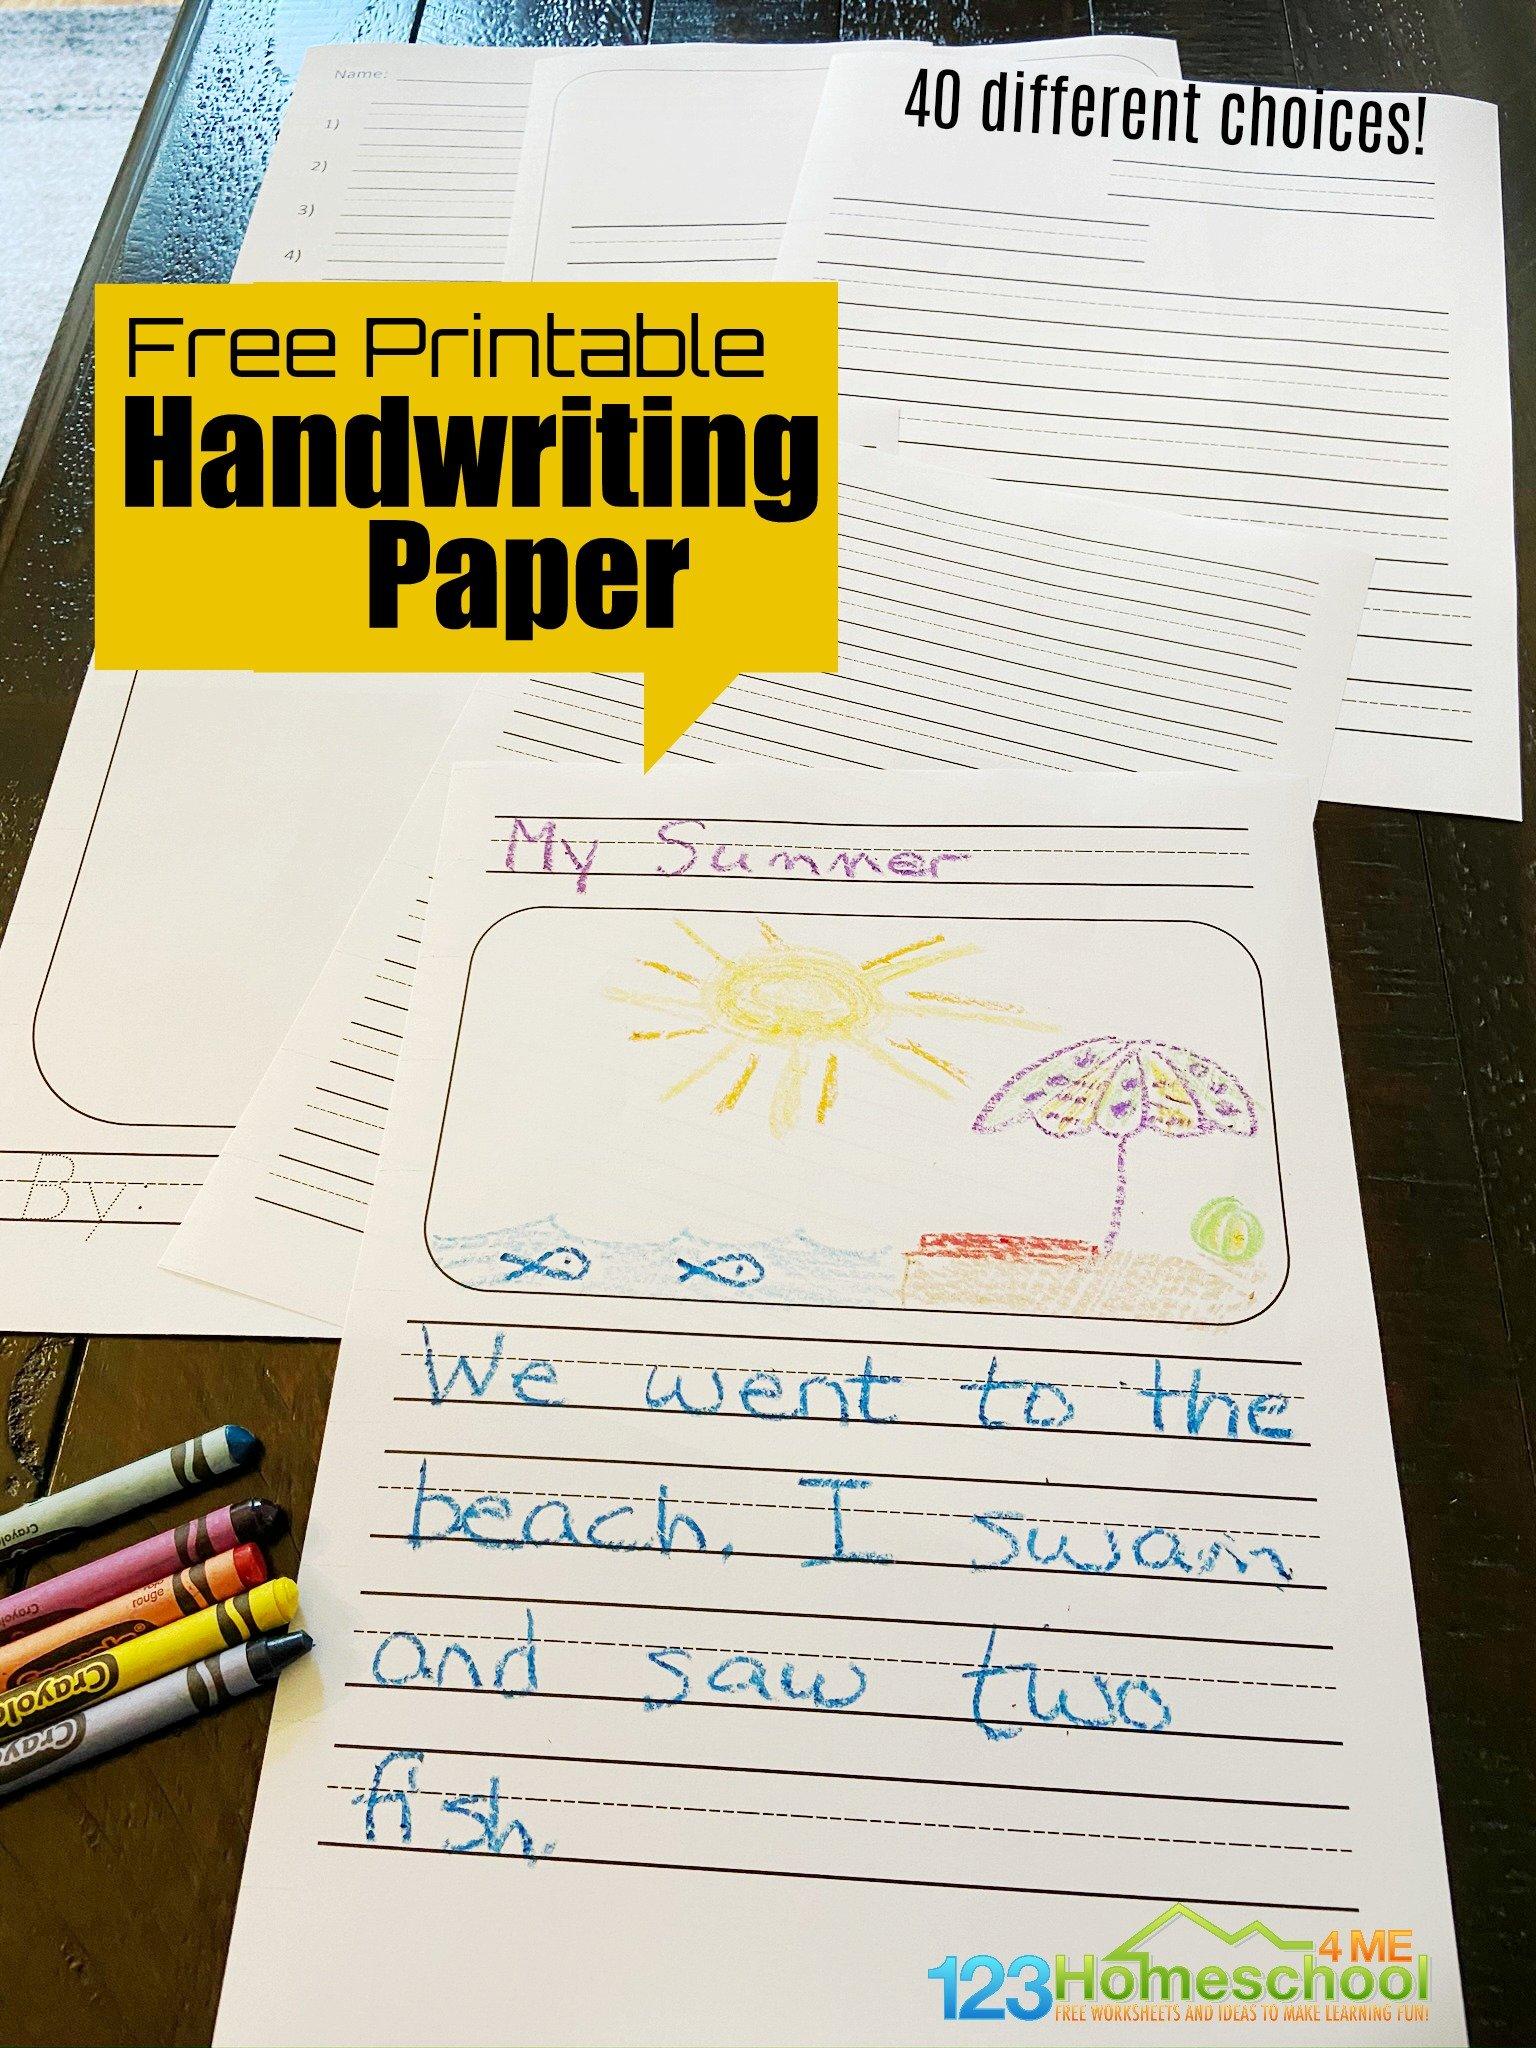 Free Printable Handwriting Paper Handwriting tablet paper printable